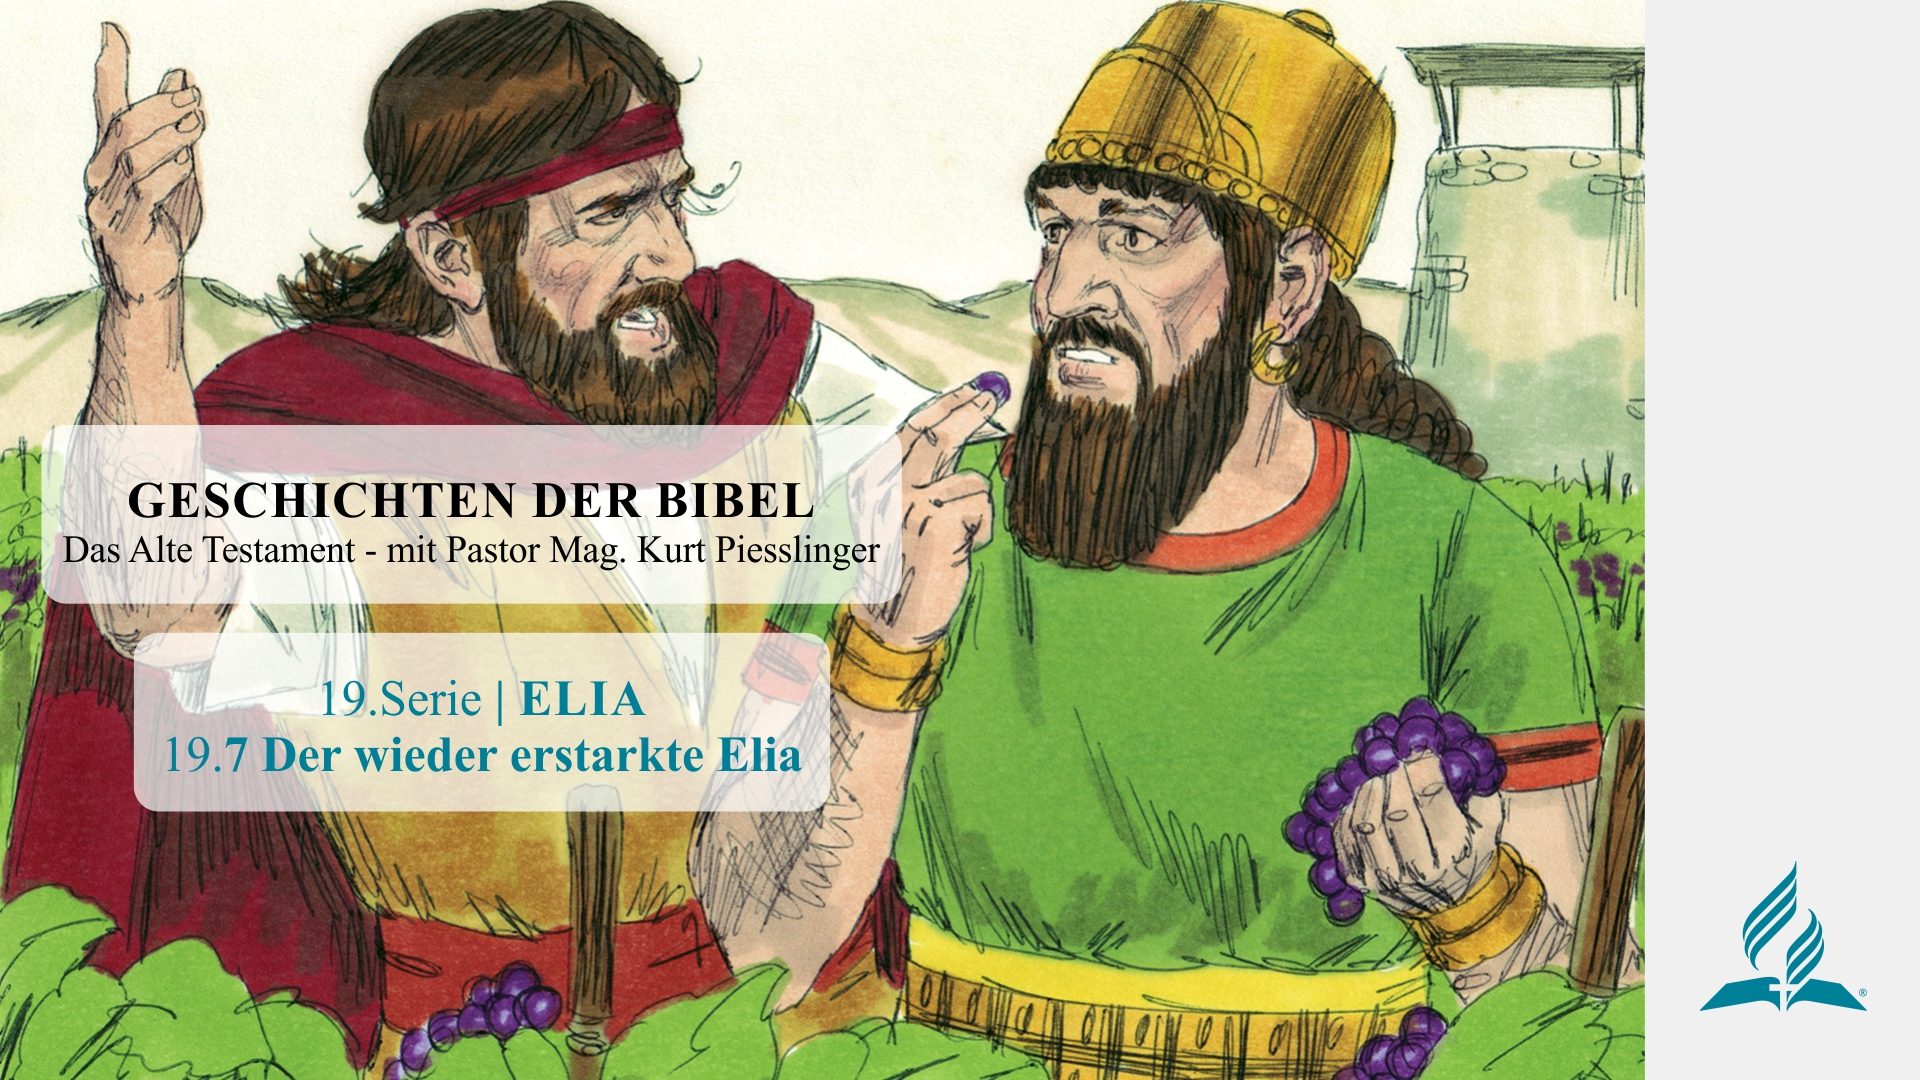 GESCHICHTEN DER BIBEL : 19.7 Der wieder erstarkte Elia – 19.ELIA | Pastor Mag. Kurt Piesslinger